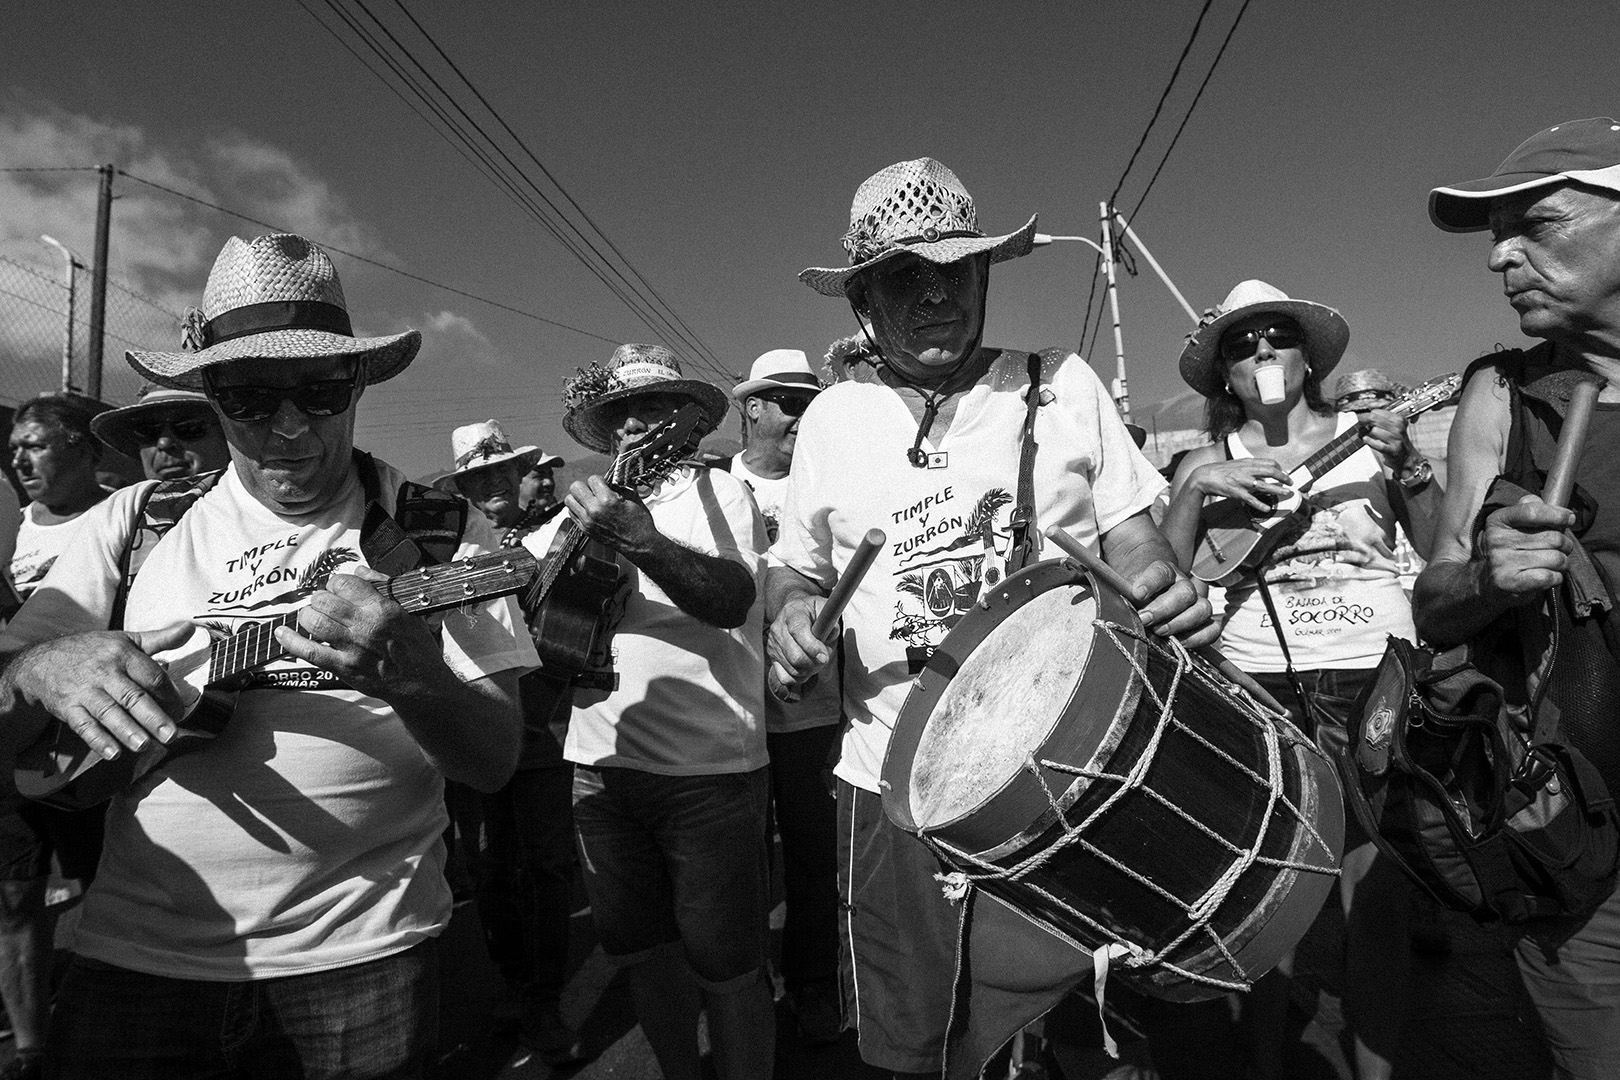 Romeria, Guimar - Socorro; Procession with music, drums